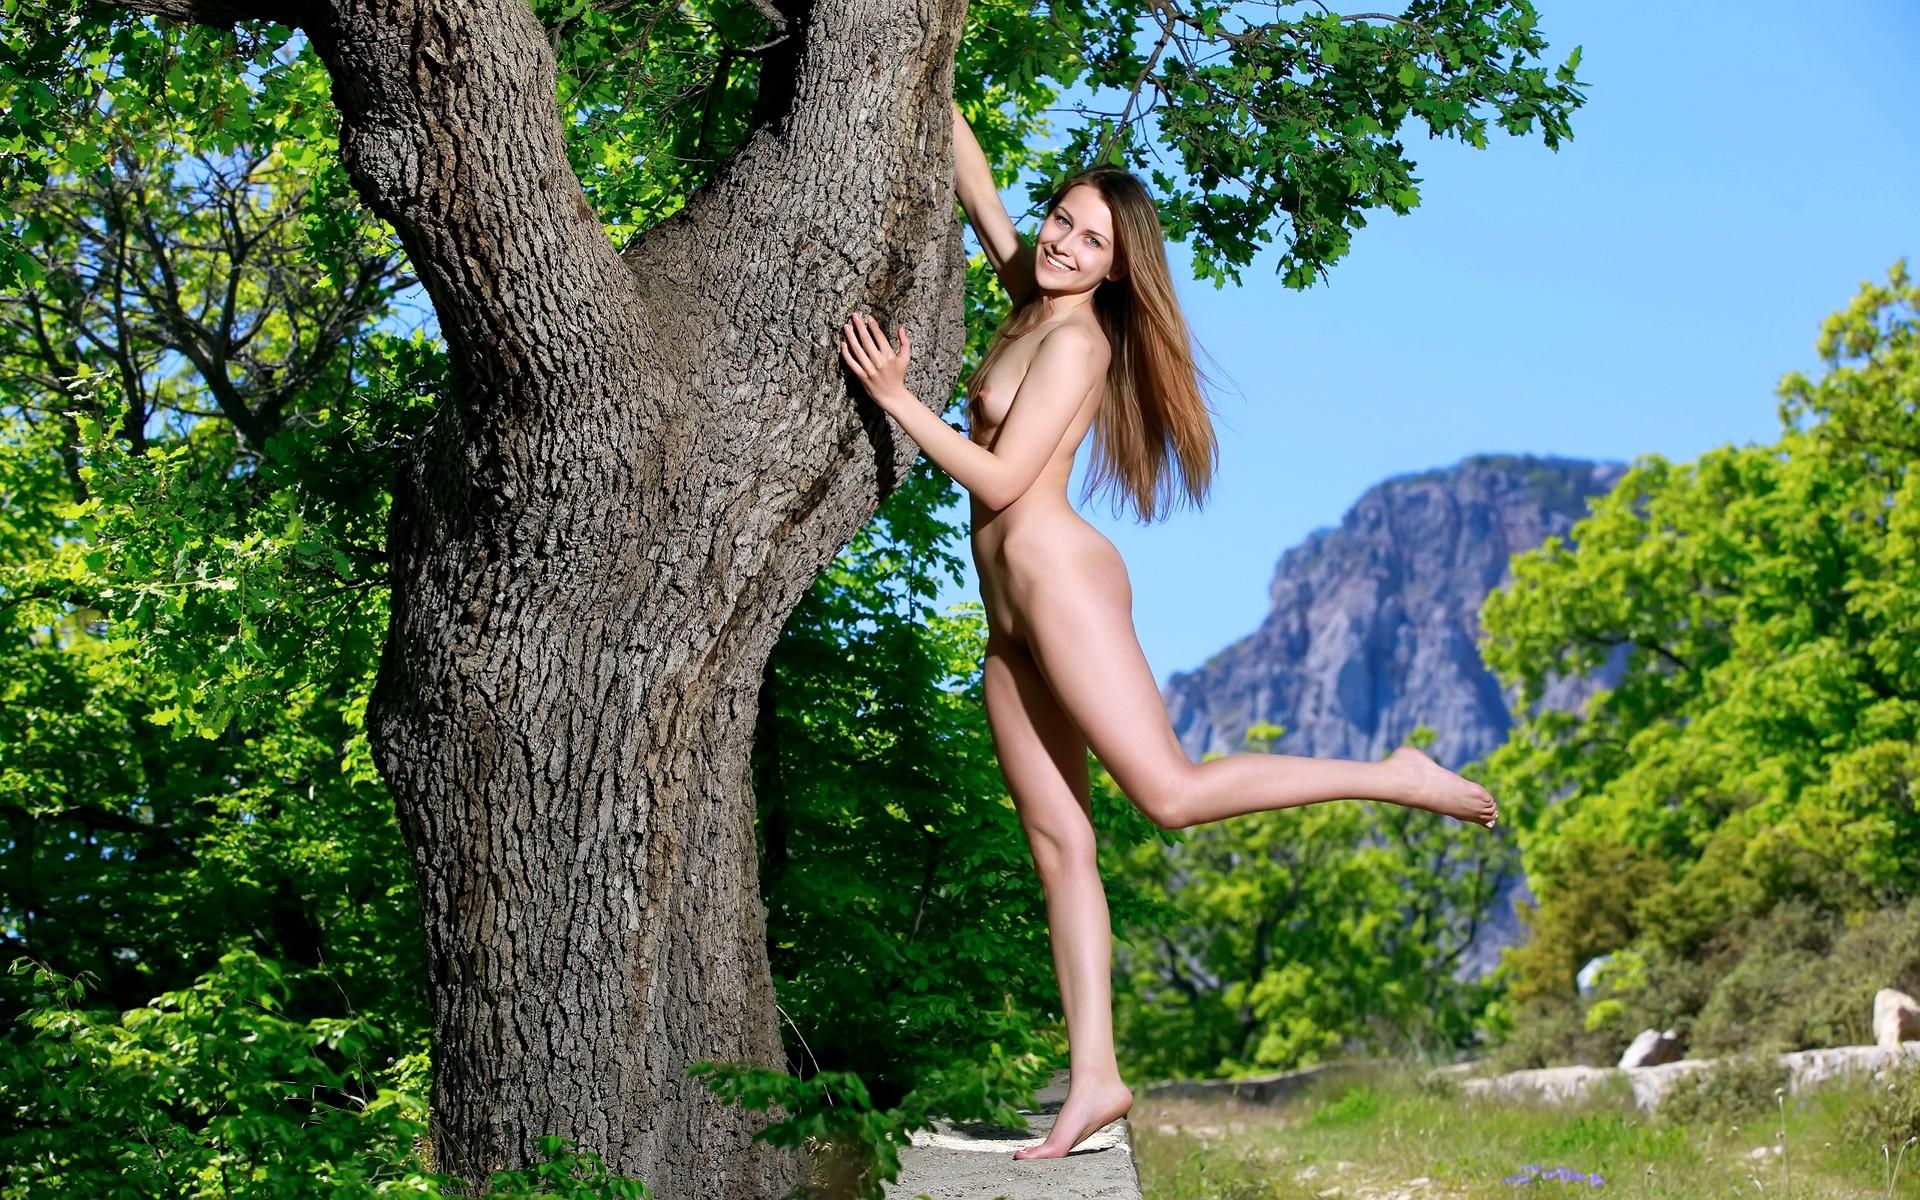 красивые голые девушки на природе